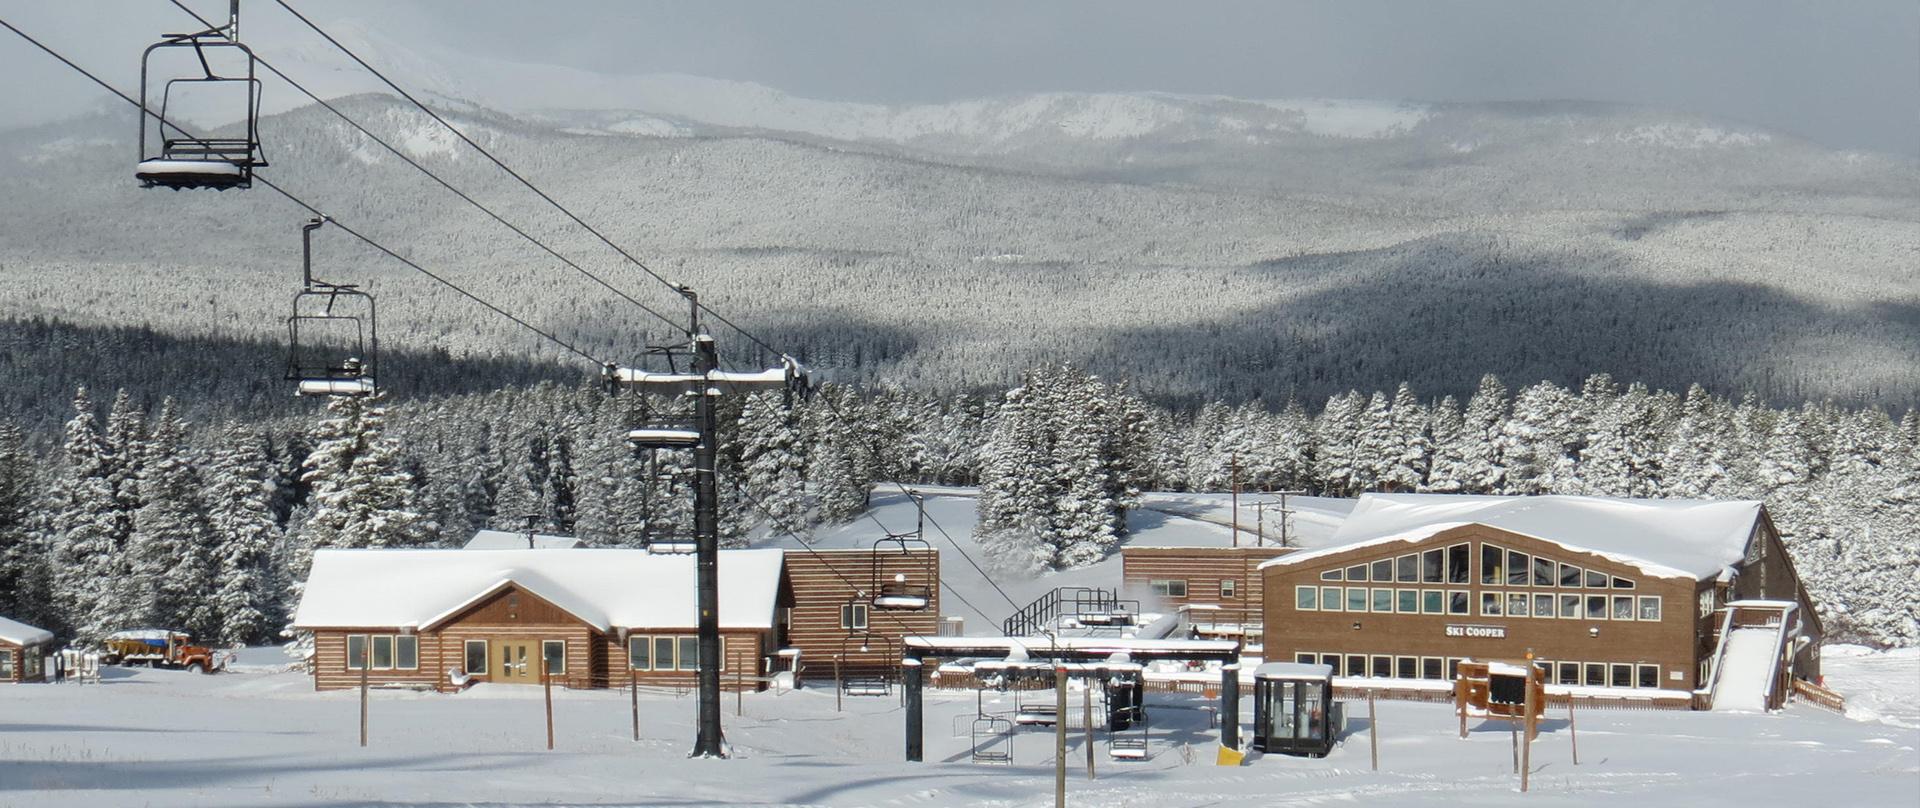 Ski Cooper Base area